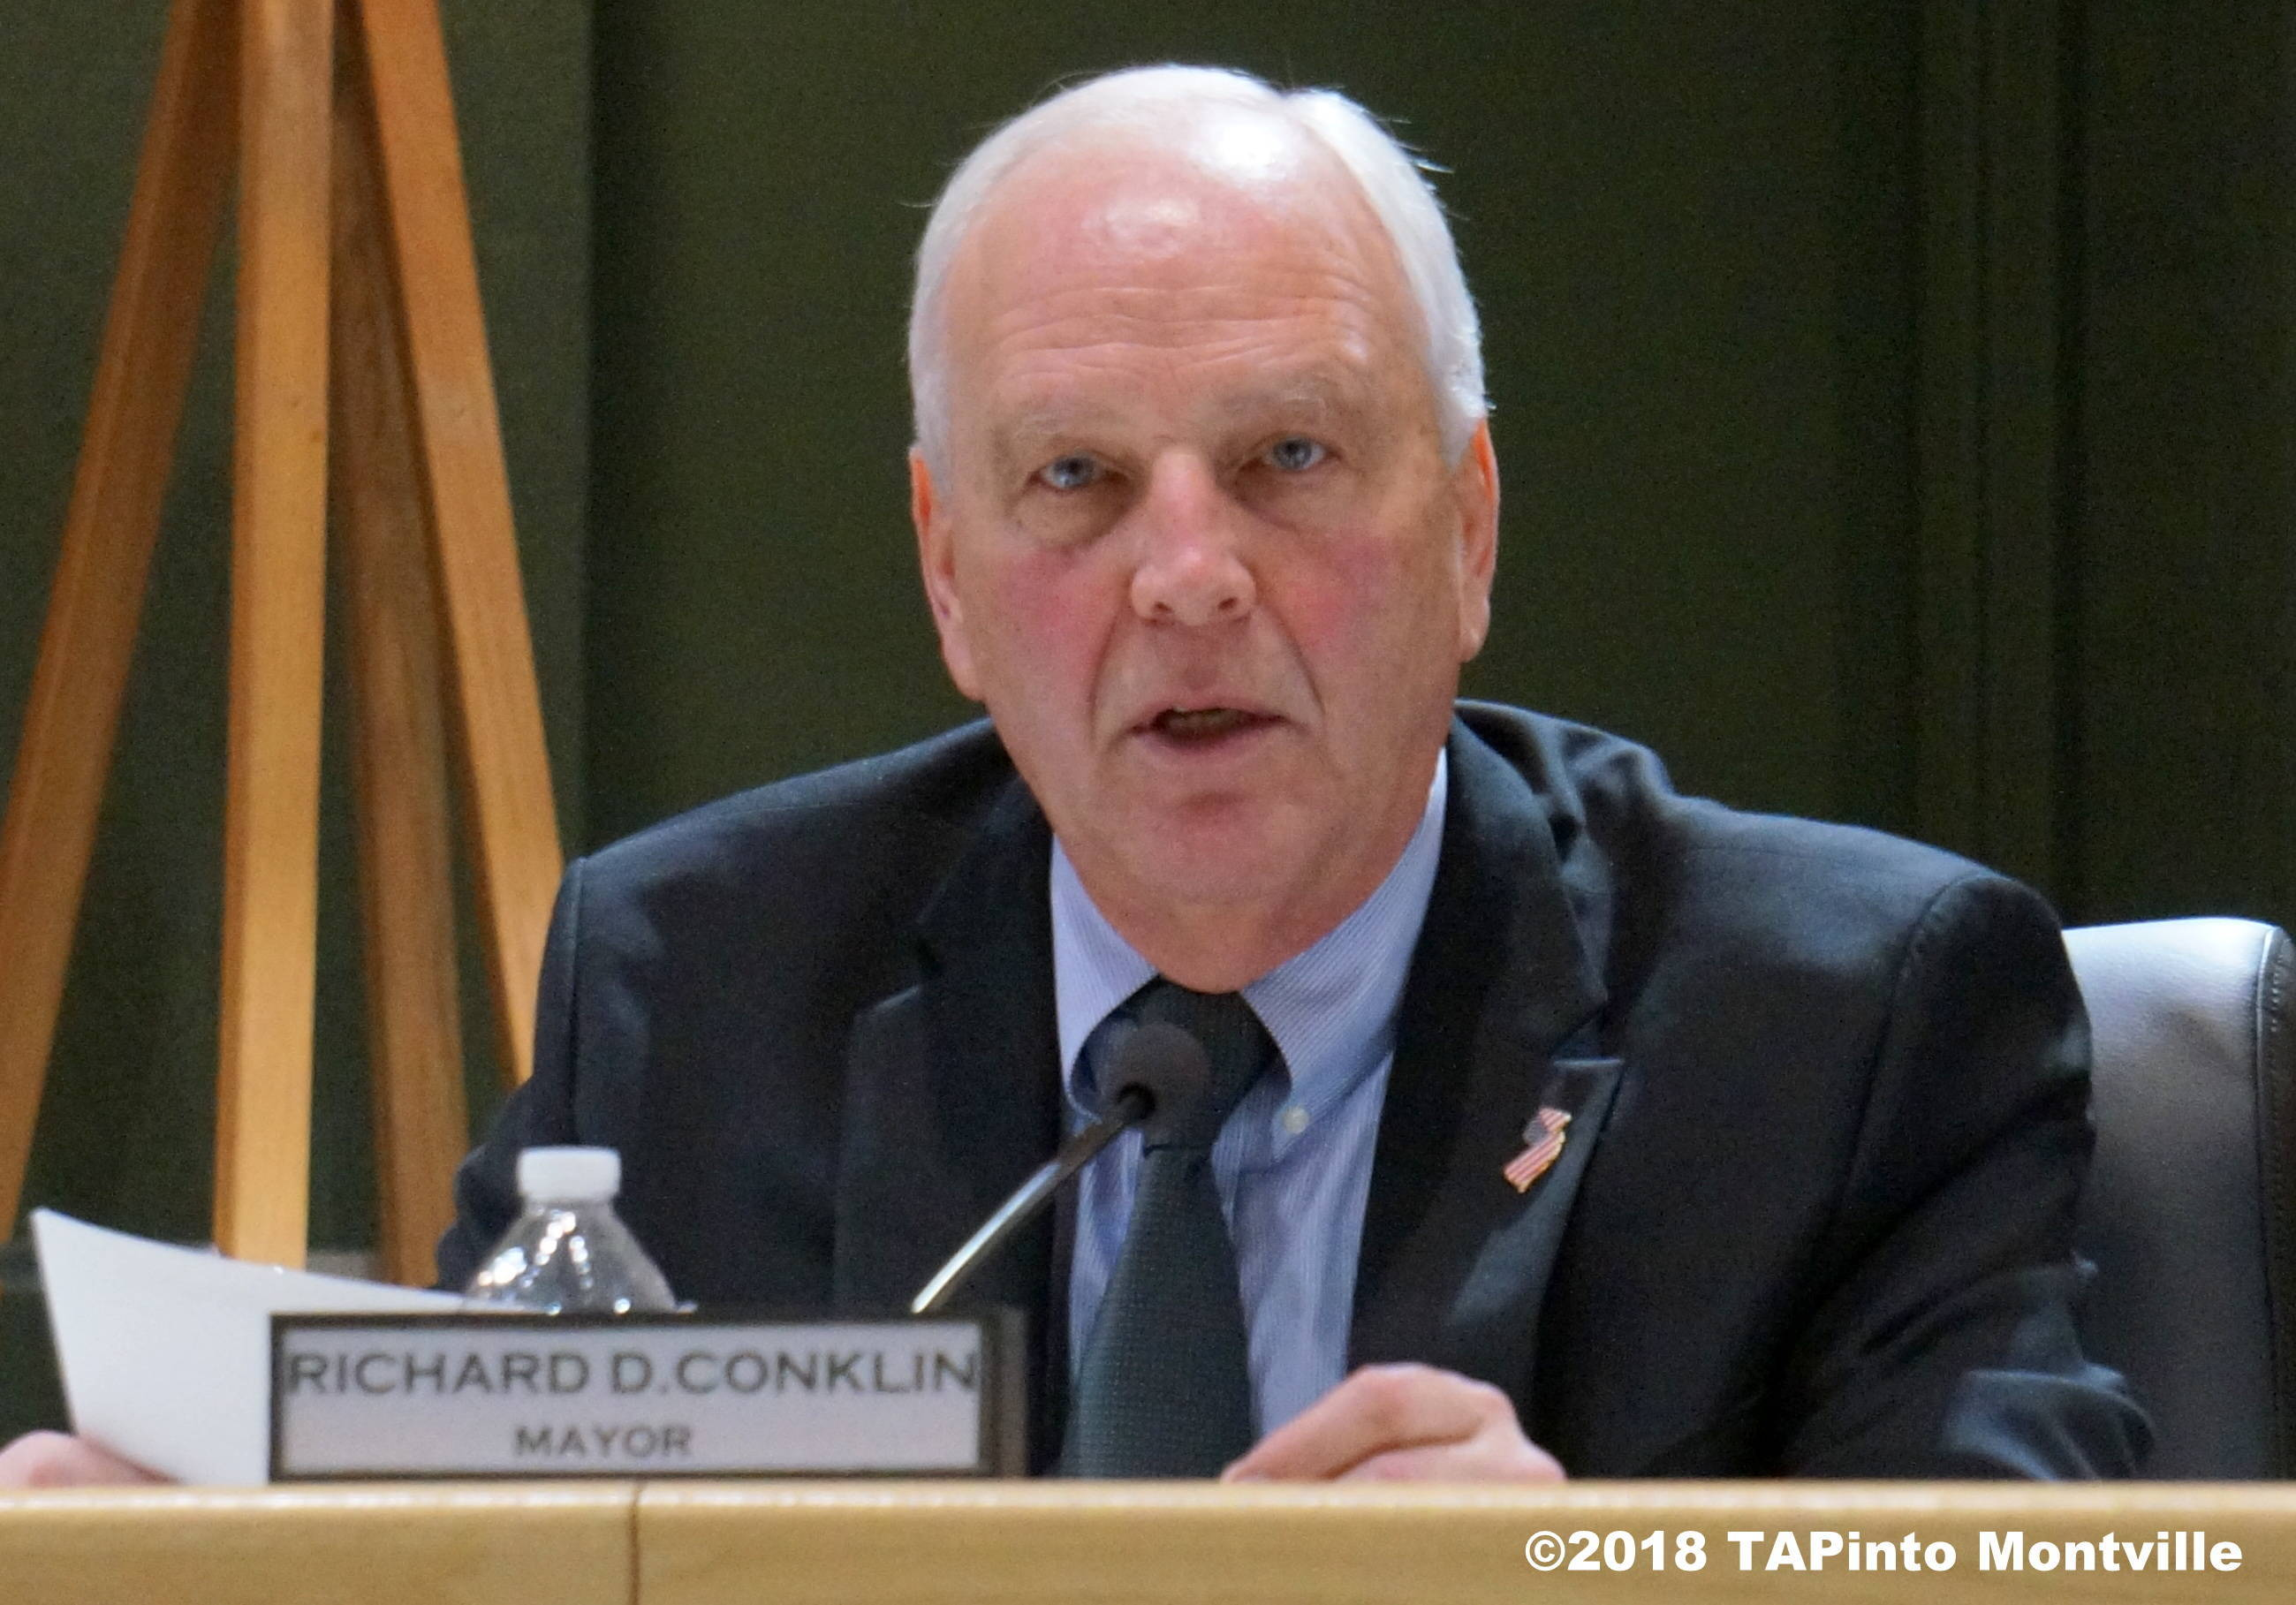 7102d418035ba4b3b919_a_Mayor_Richard_Conklin__2018_TAPinto_Montville.JPG